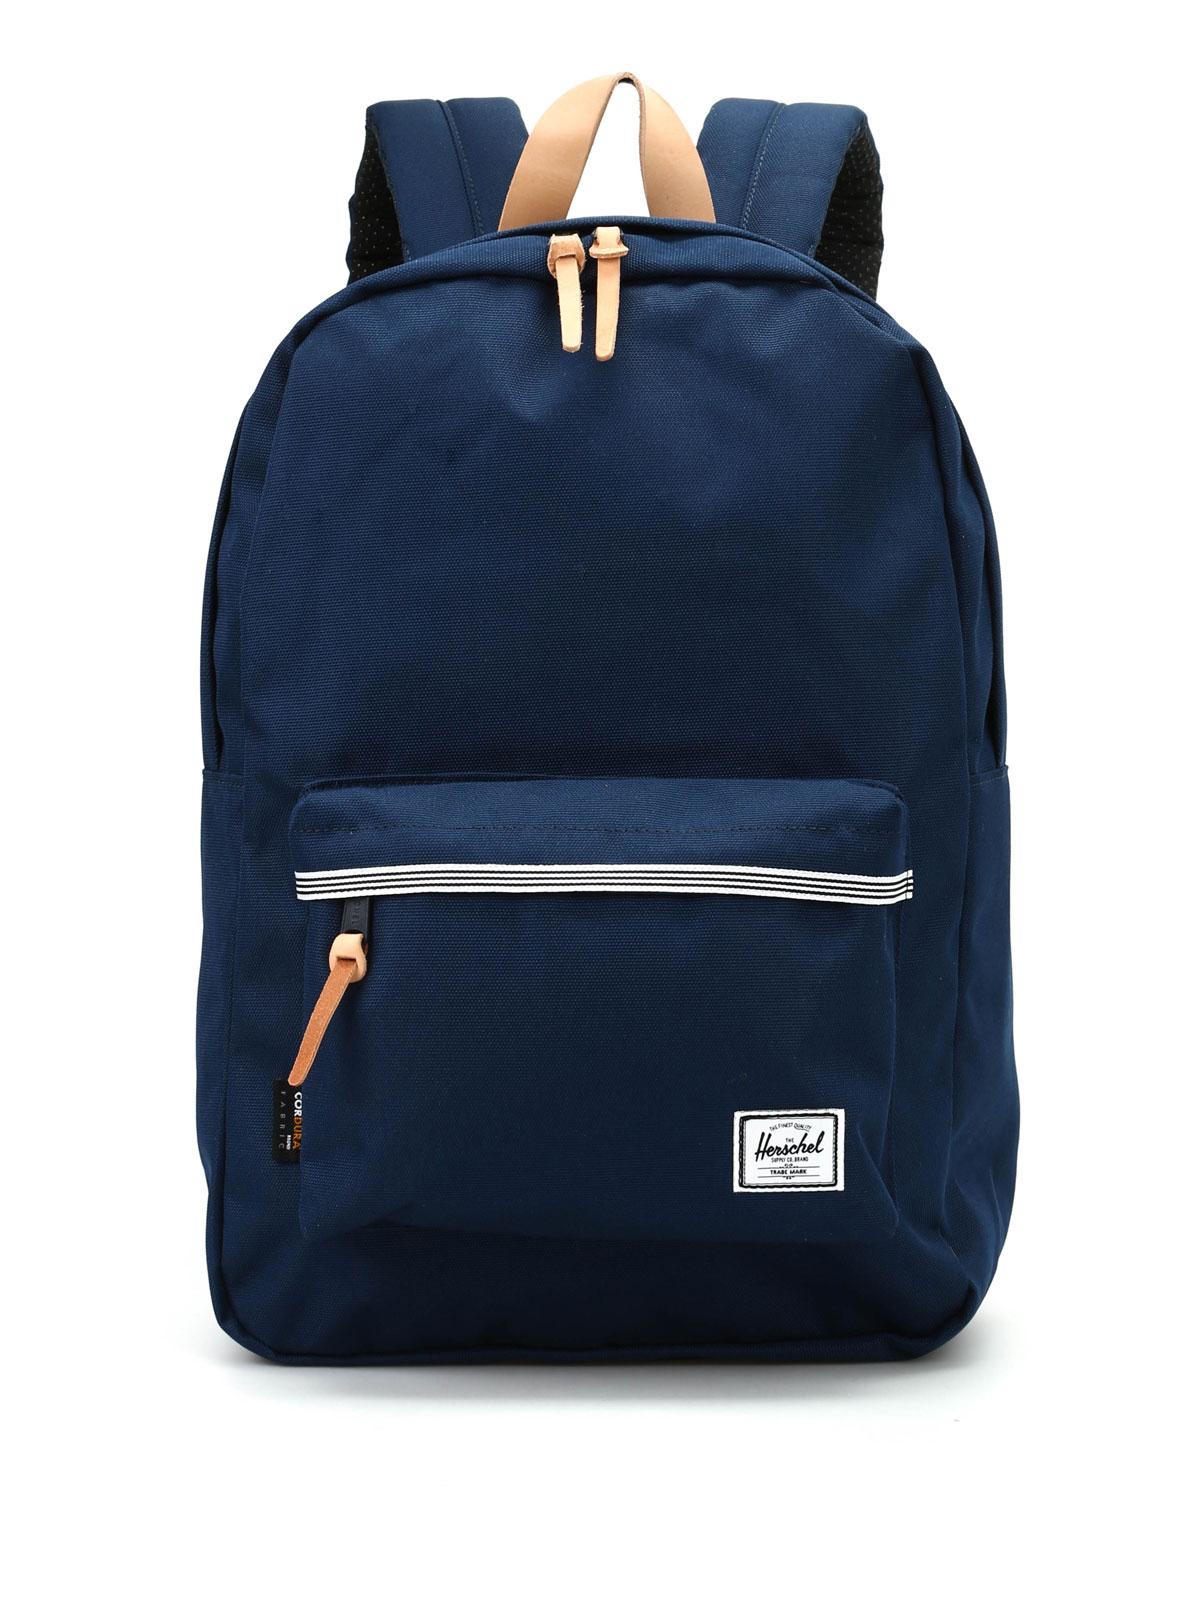 19cf9147f44 Herschel - Winlaw backpack - backpacks - 10230 00886 OS | iKRIX.com